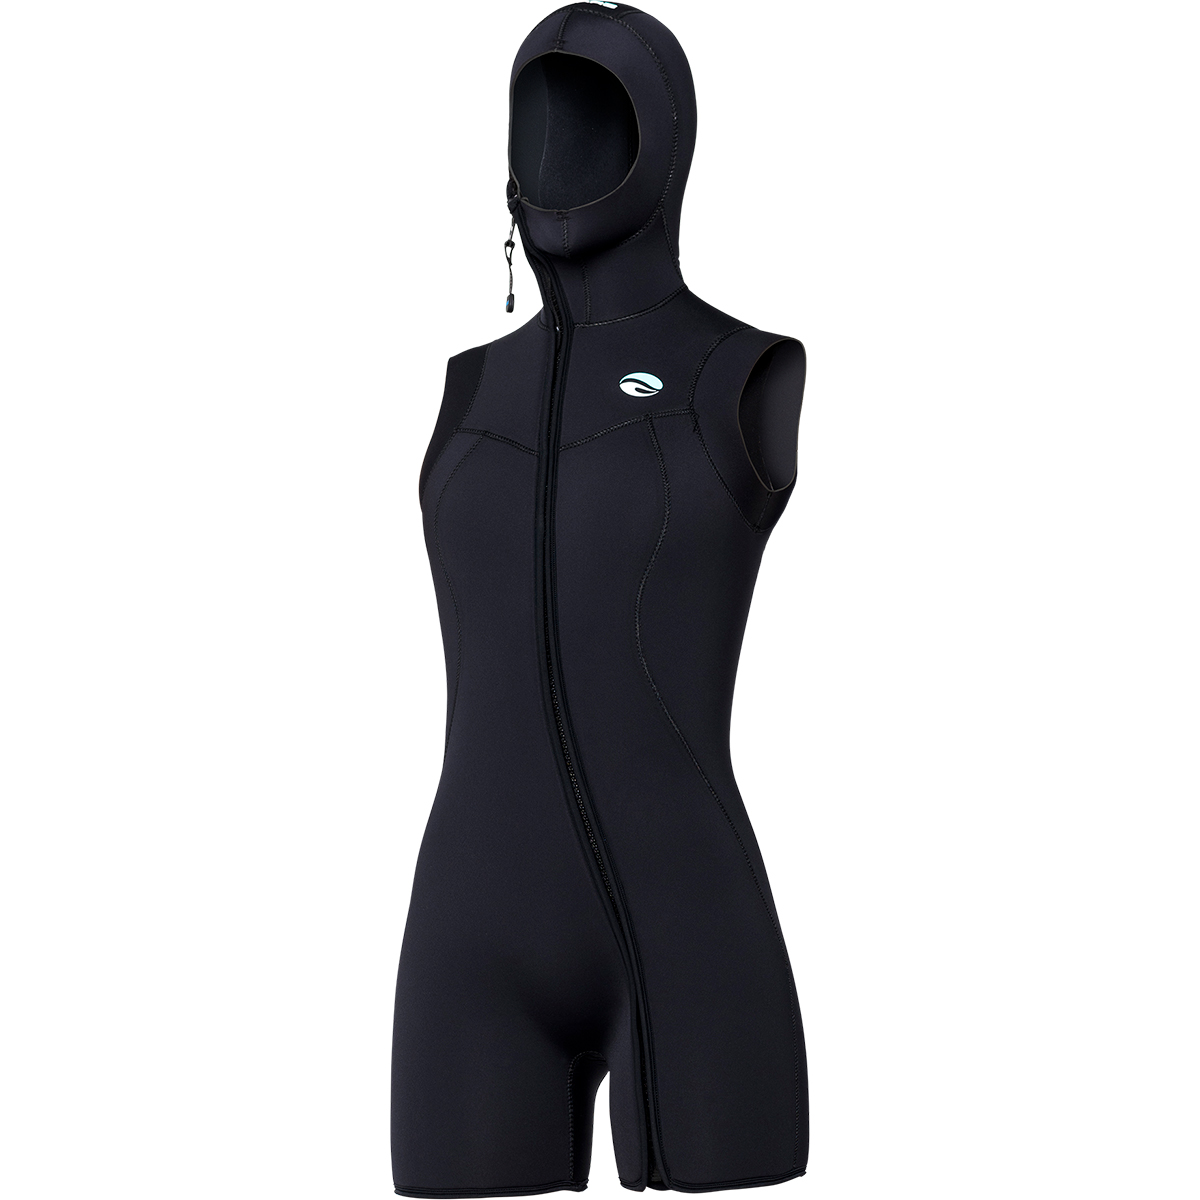 7mm  Step-in Hooded Vest - Women